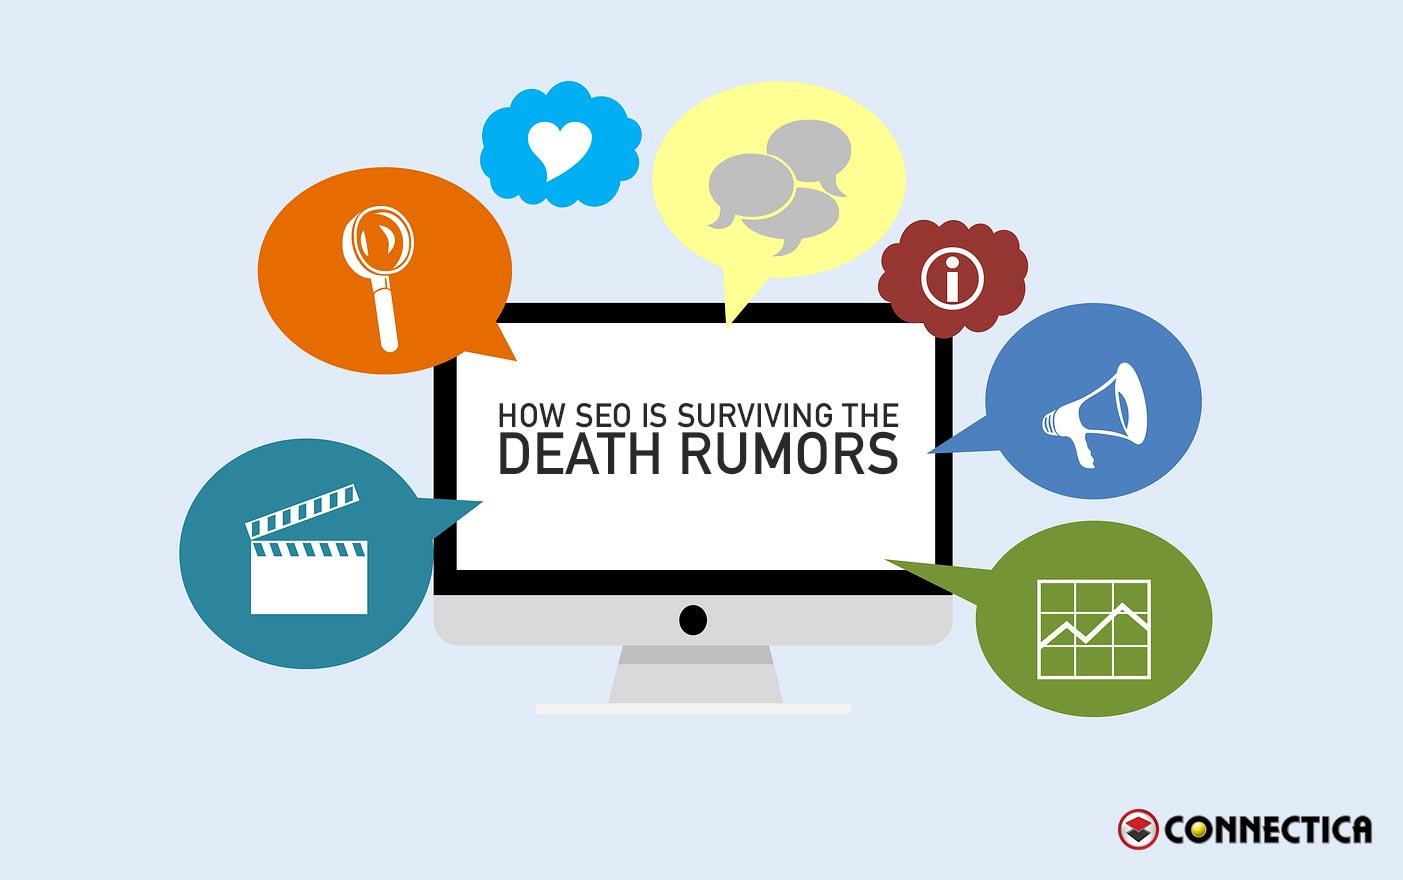 seo survives death rumors